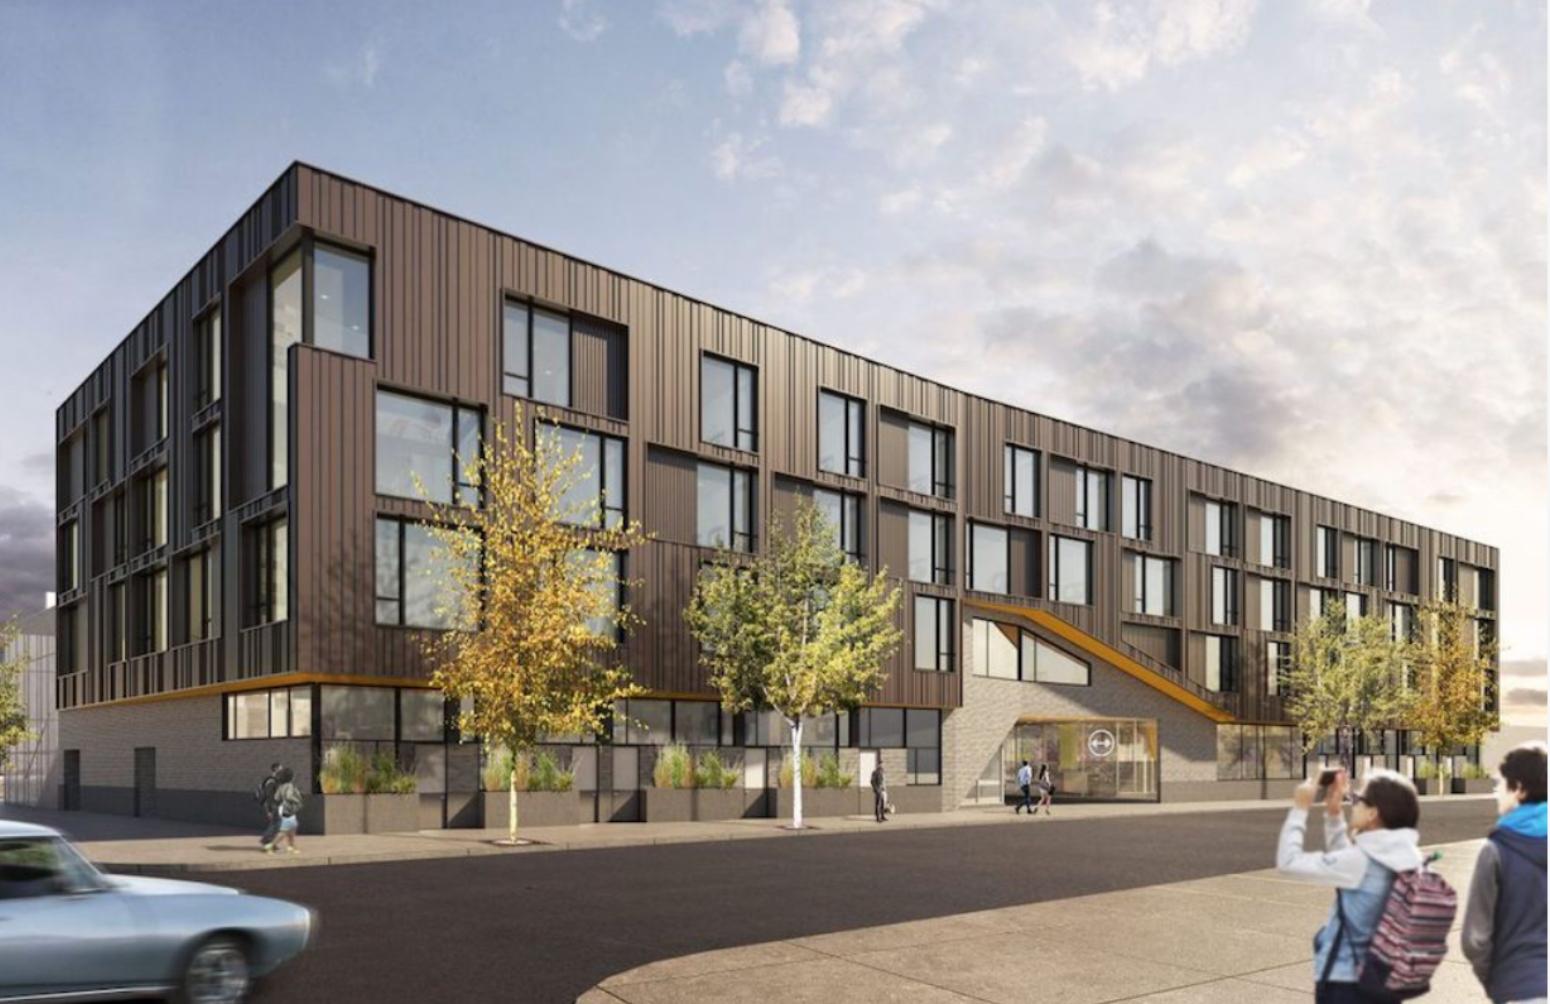 The Block at SoNo at 456 North 5th Street. Credit: ISA Architects